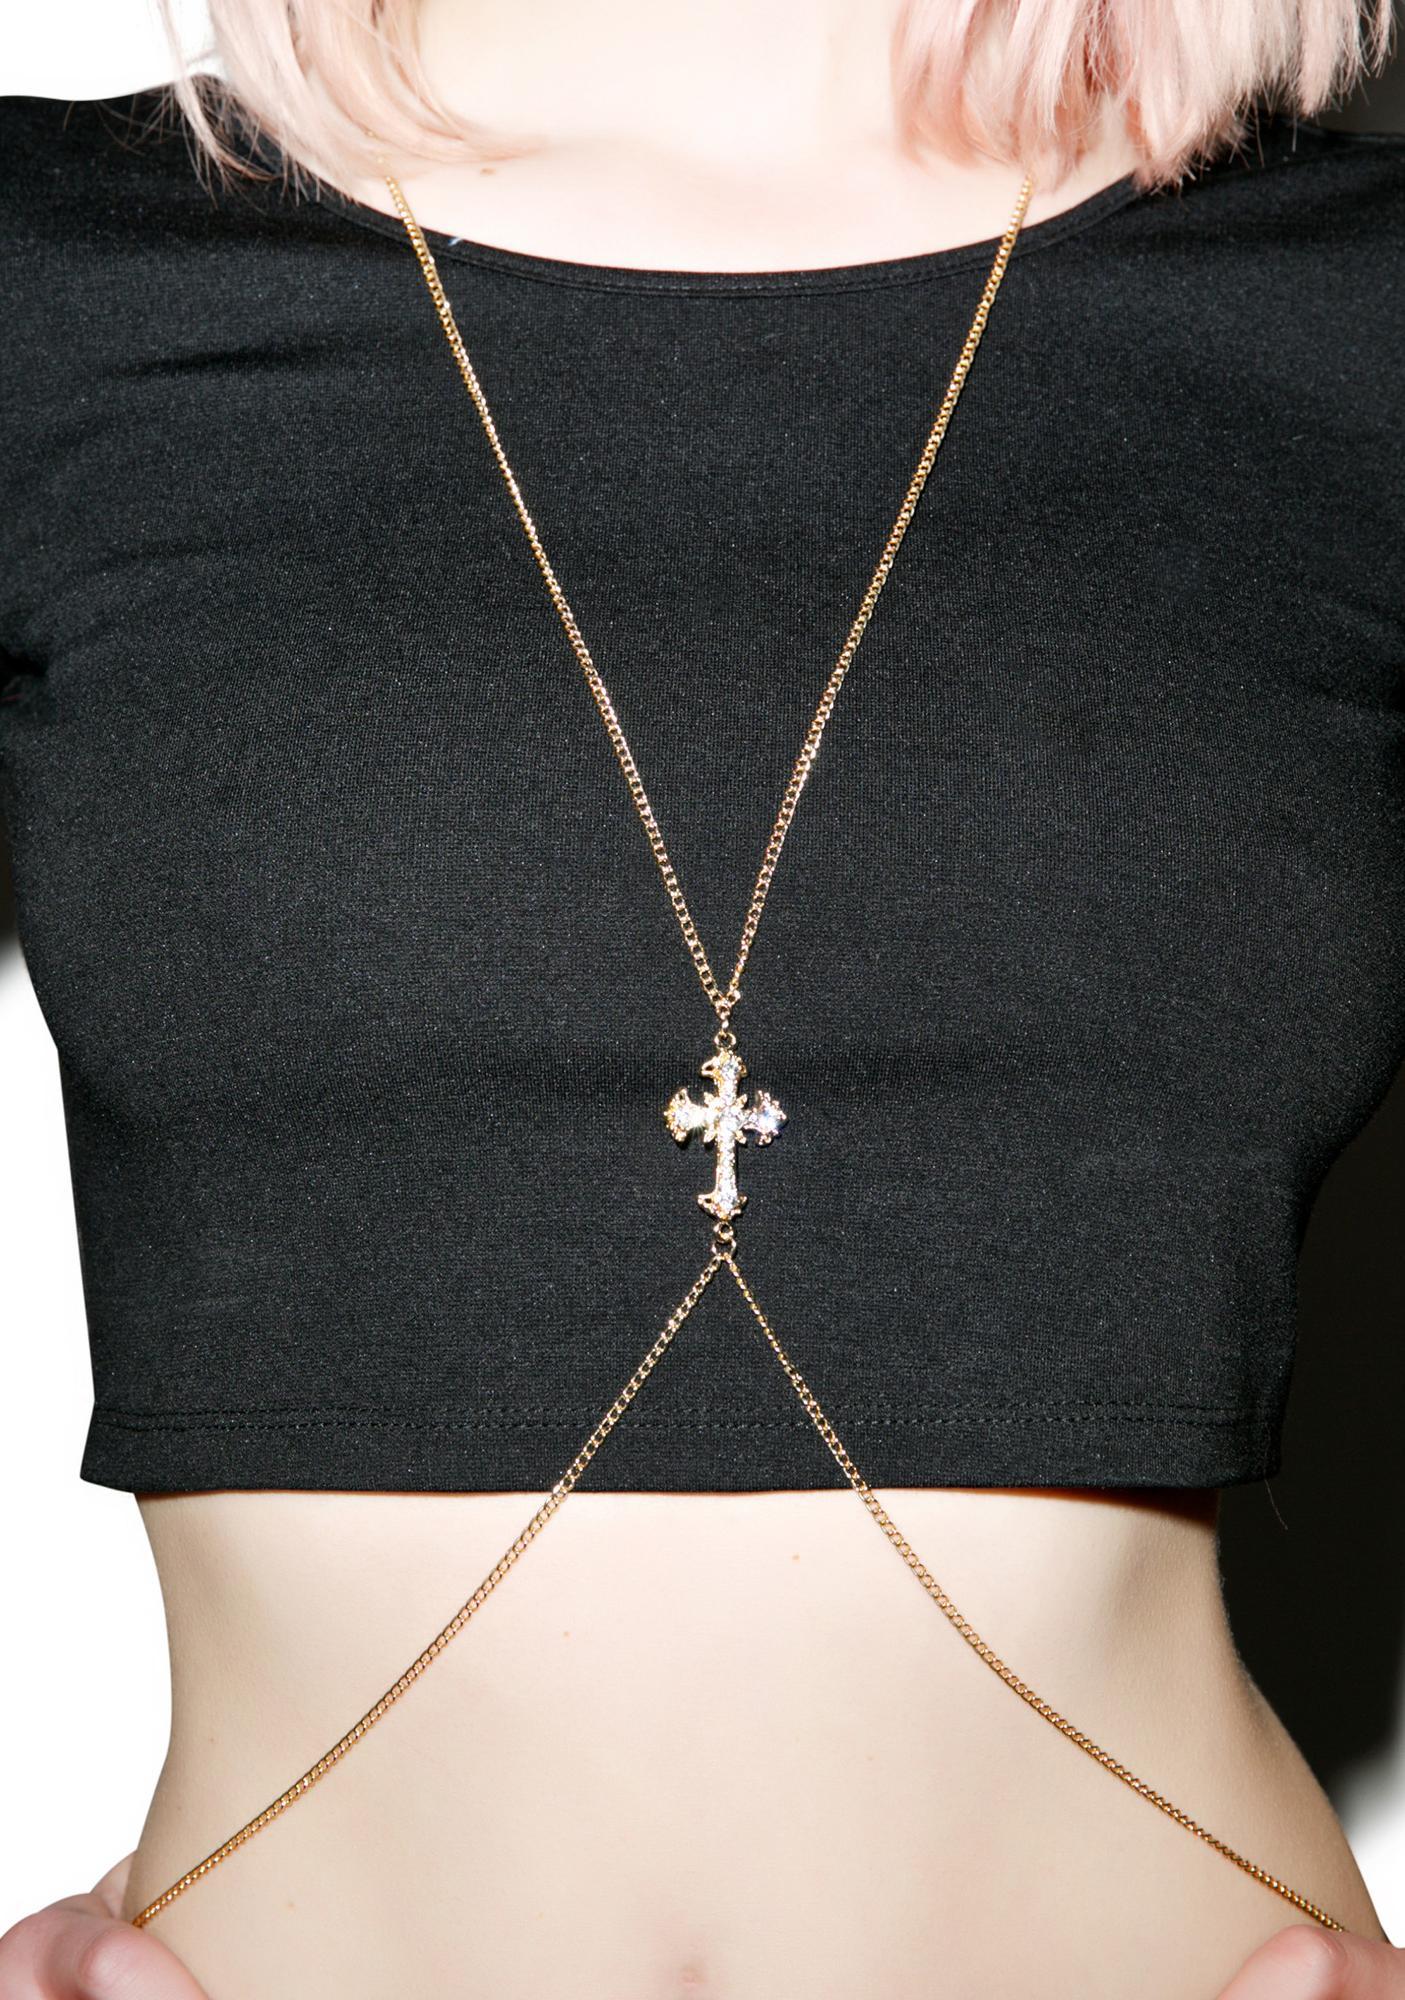 Crucify Her Soul Body Chain